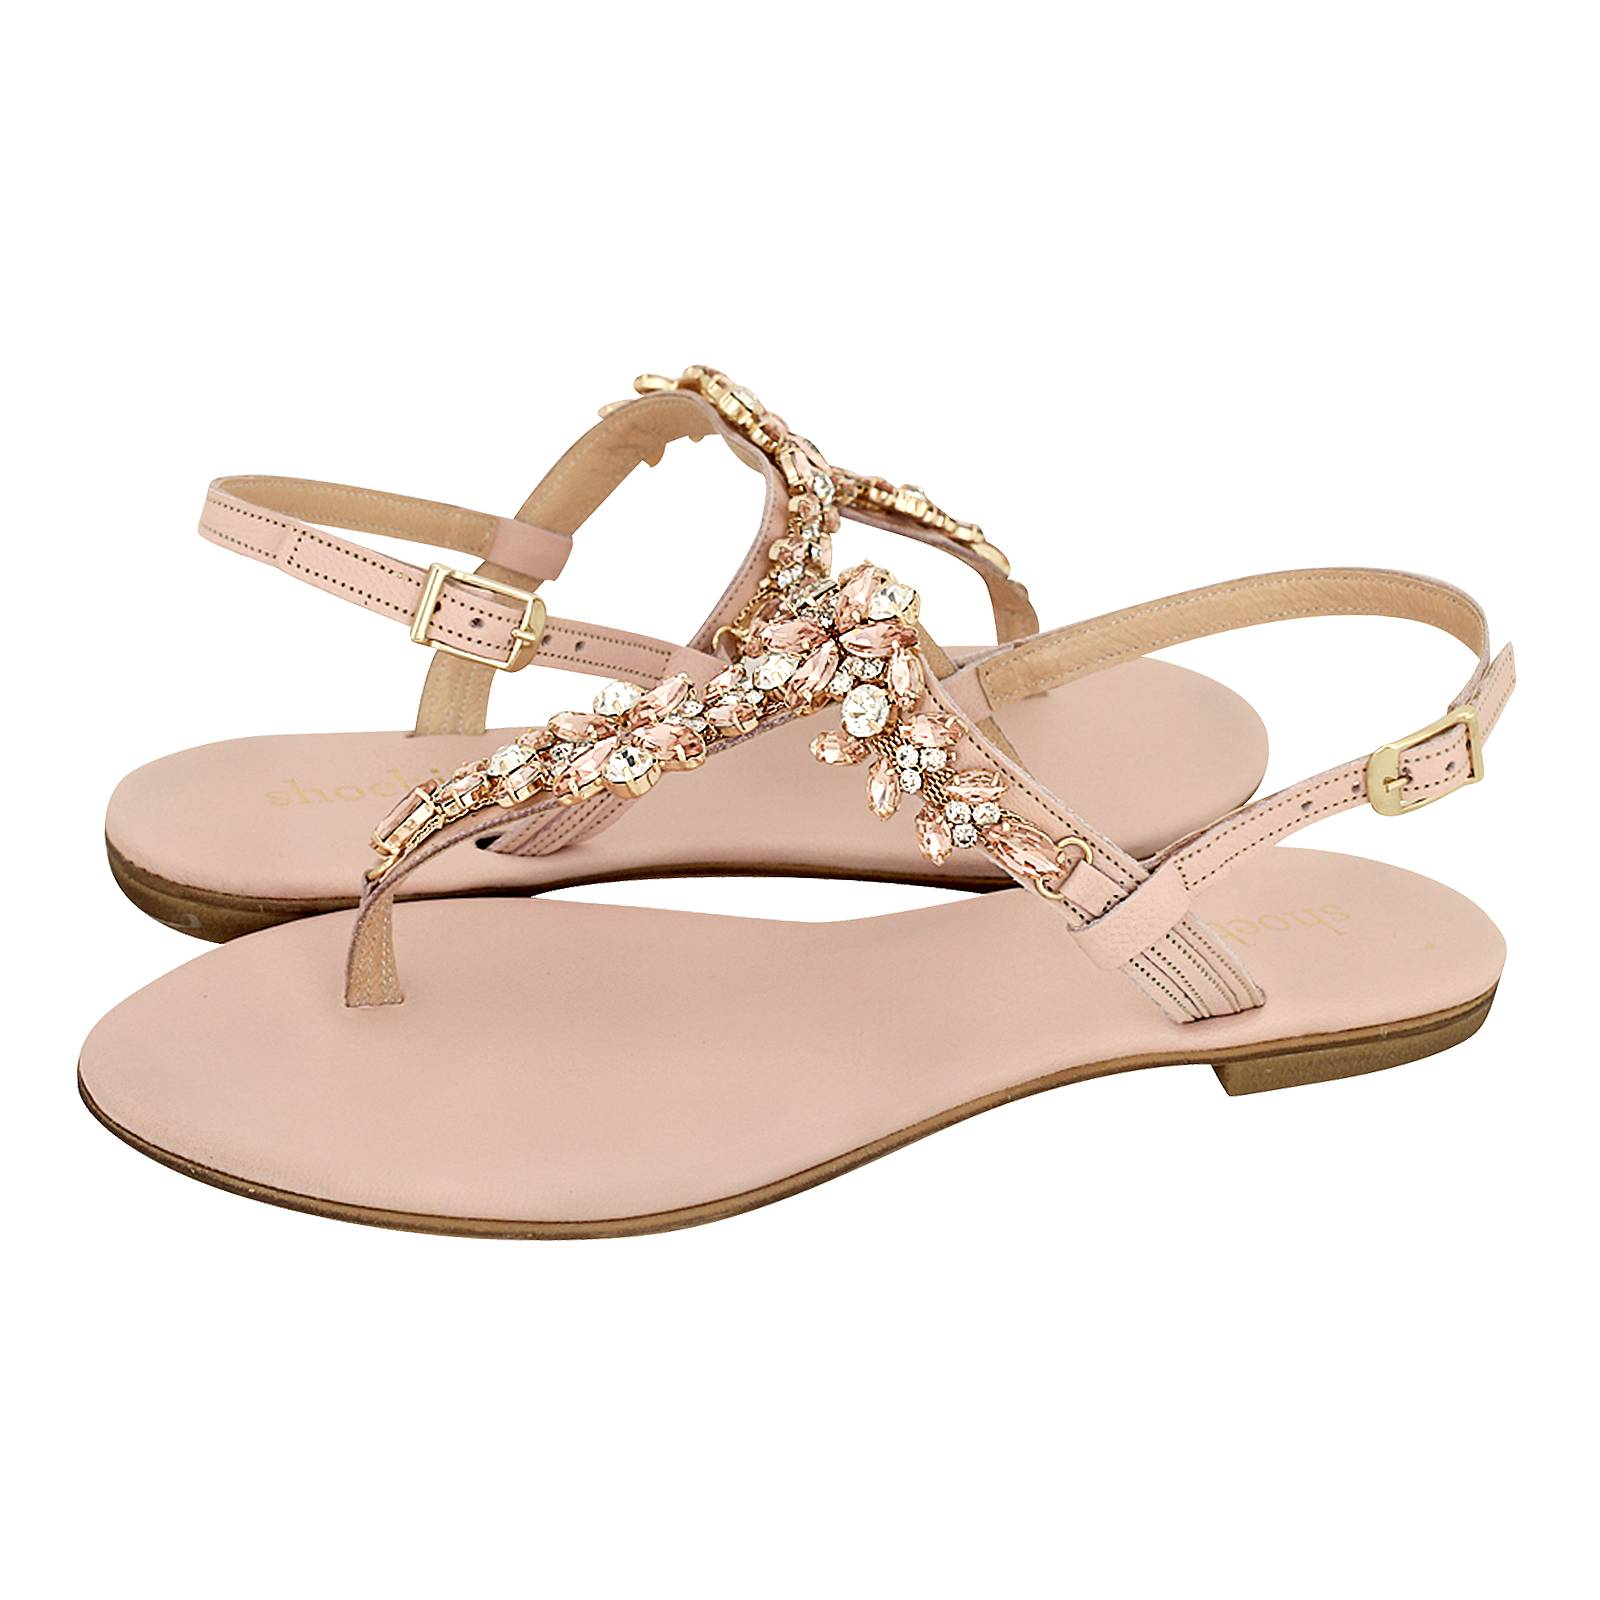 Noves - Γυναικείες σαγιονάρες Shoe Bizz από δέρμα - Gianna Kazakou ... 4d2c56fd128